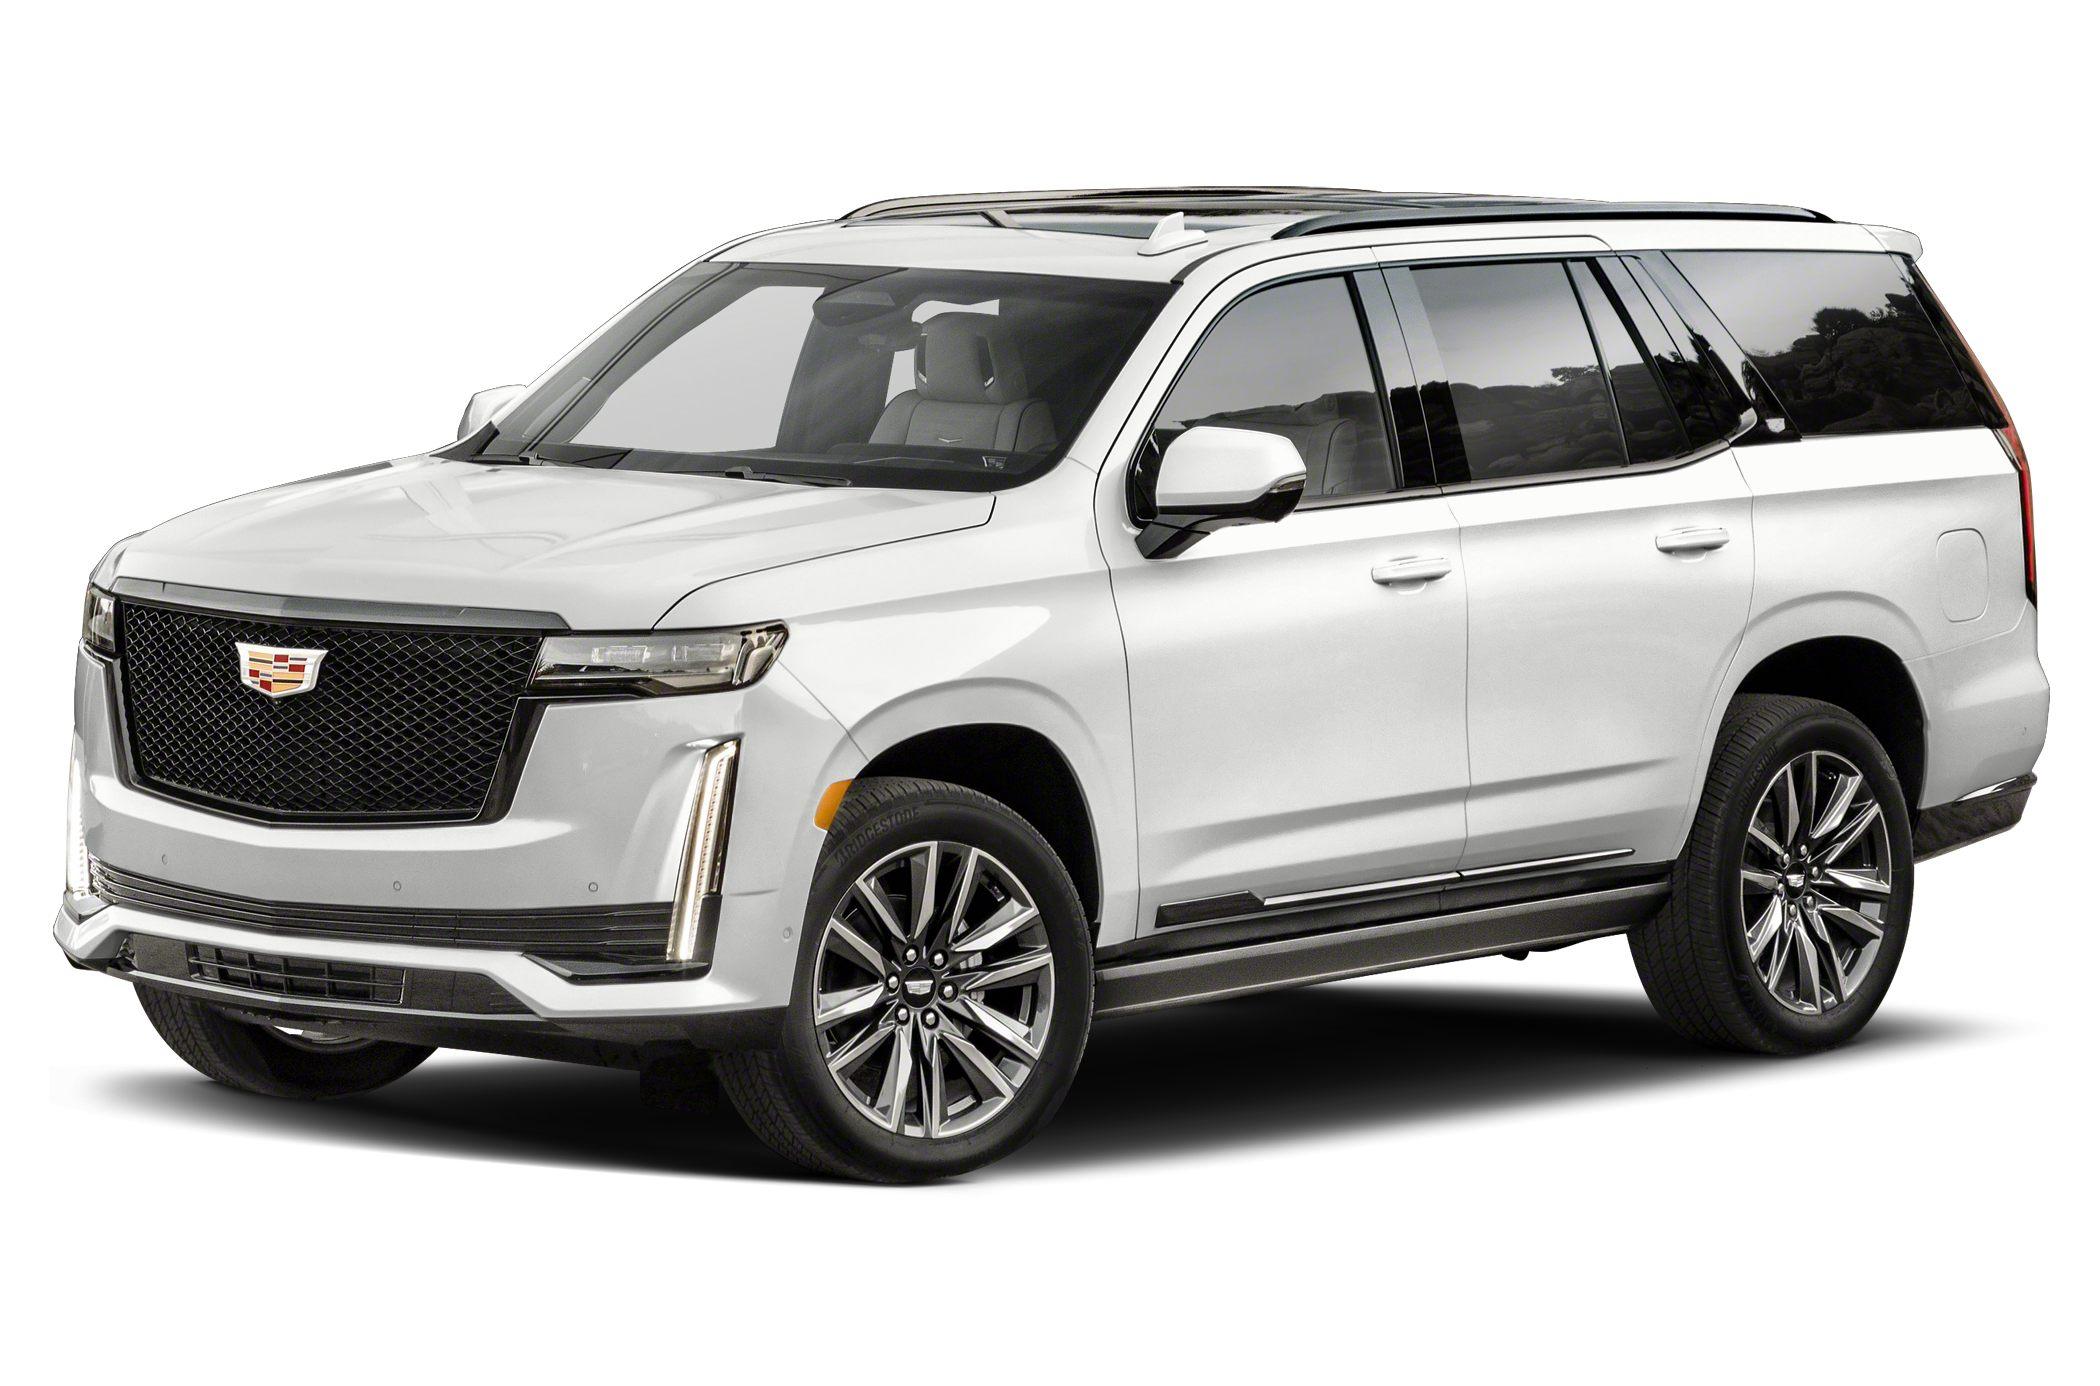 2021 Cadillac Escalade Luxury 4x4 Specs And Prices